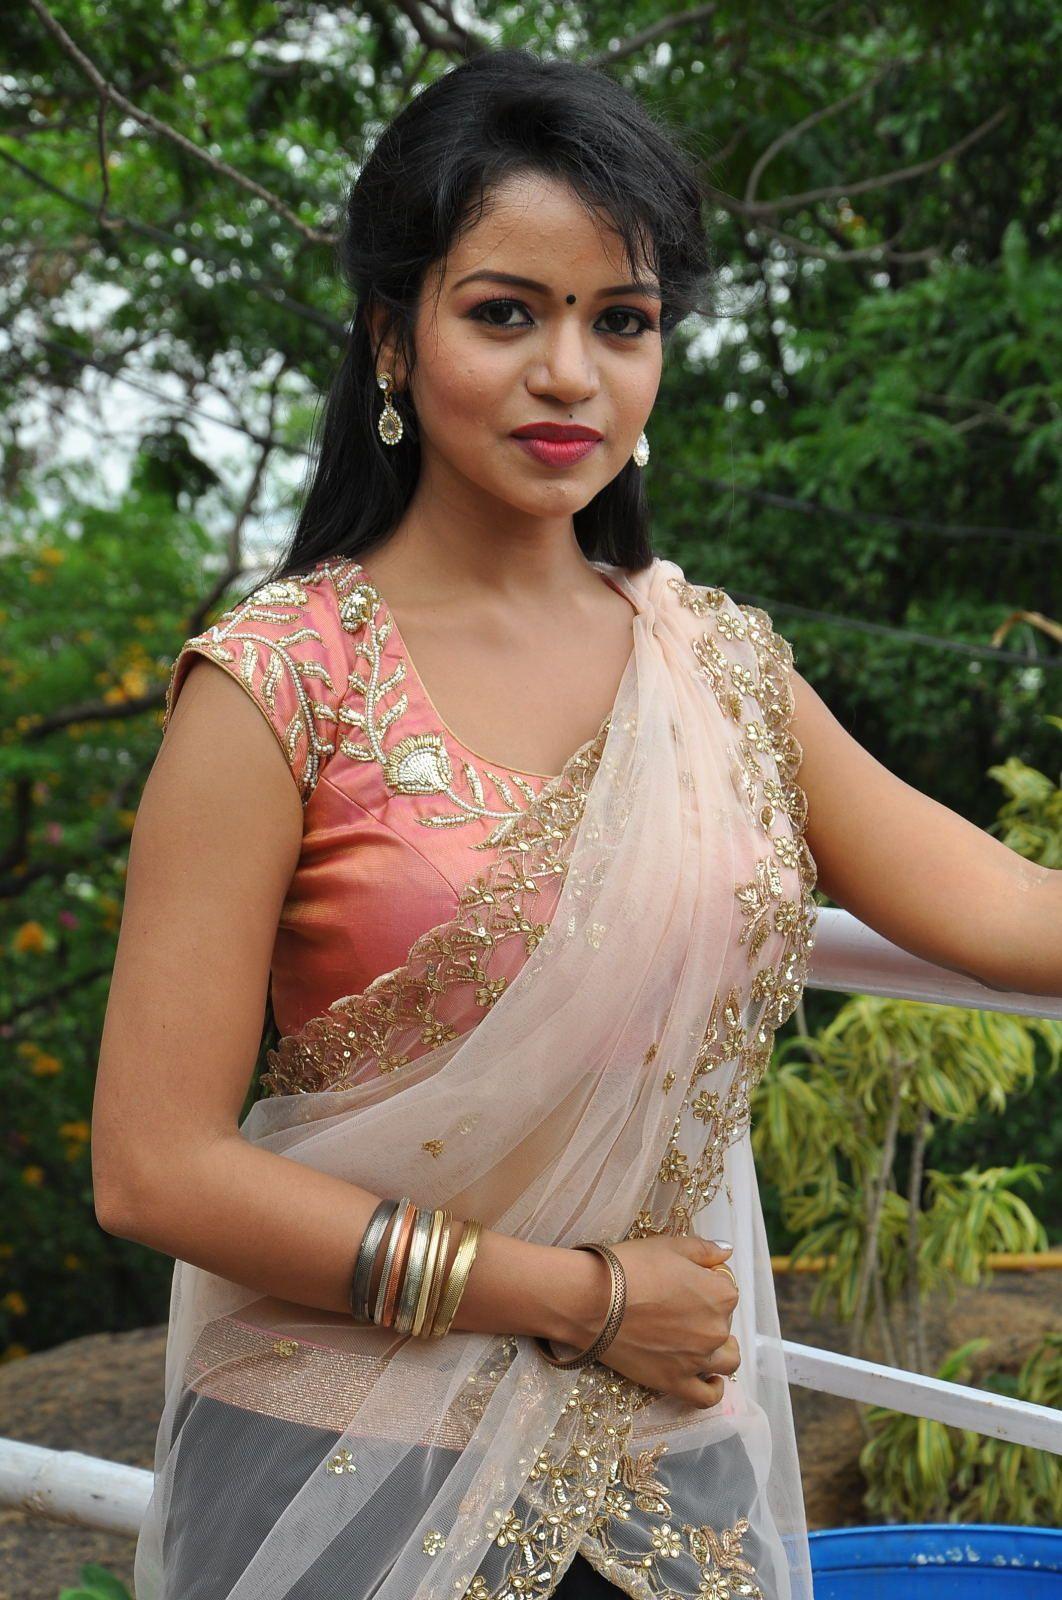 ... Latest Tamil Actress, Telugu Actress, Movies, Actor Images Wallpapers